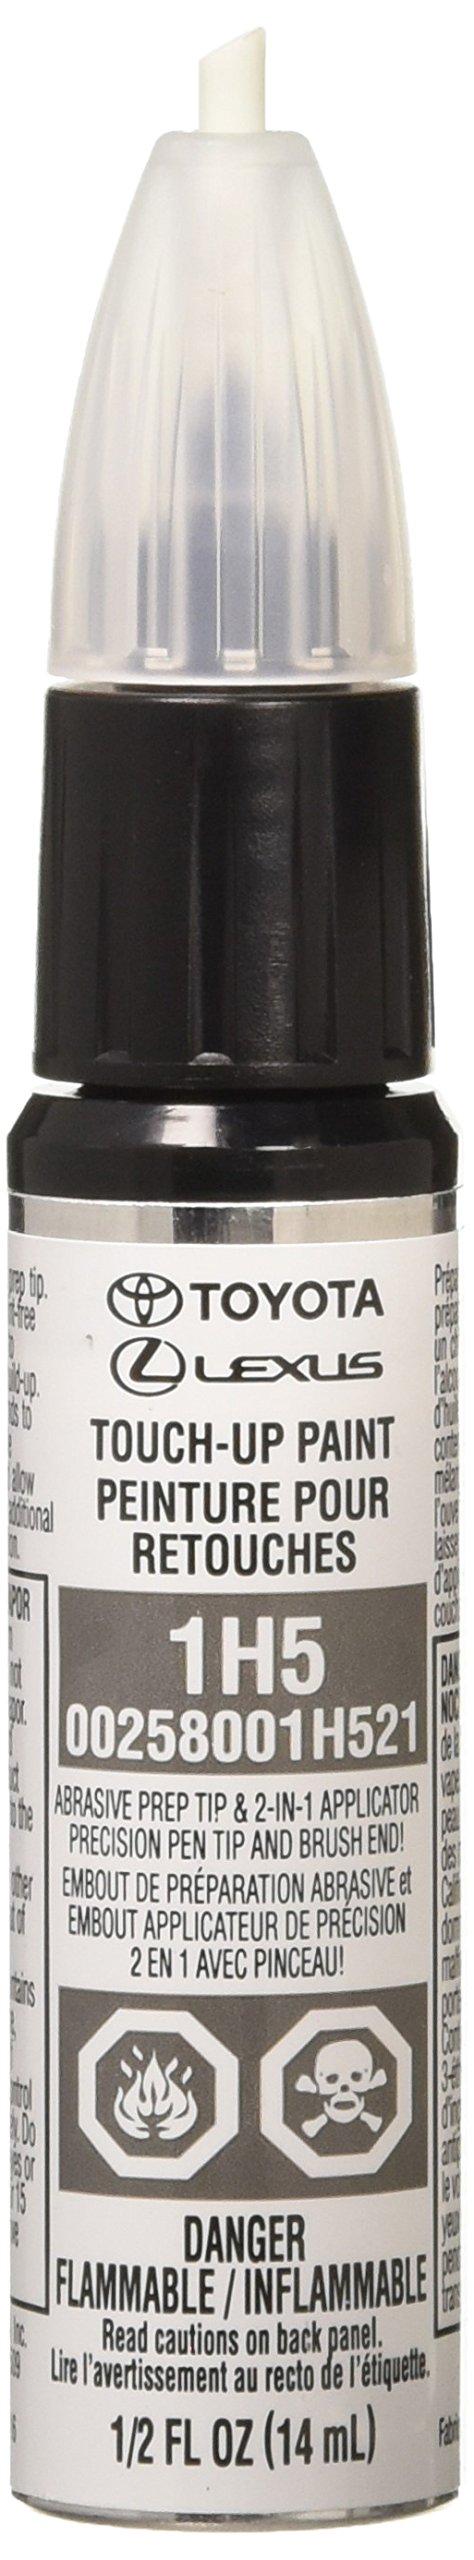 Genuine Toyota 00258-001H5-21 Cement Touch-Up Paint Pen (.44 fl oz, 13 ml)